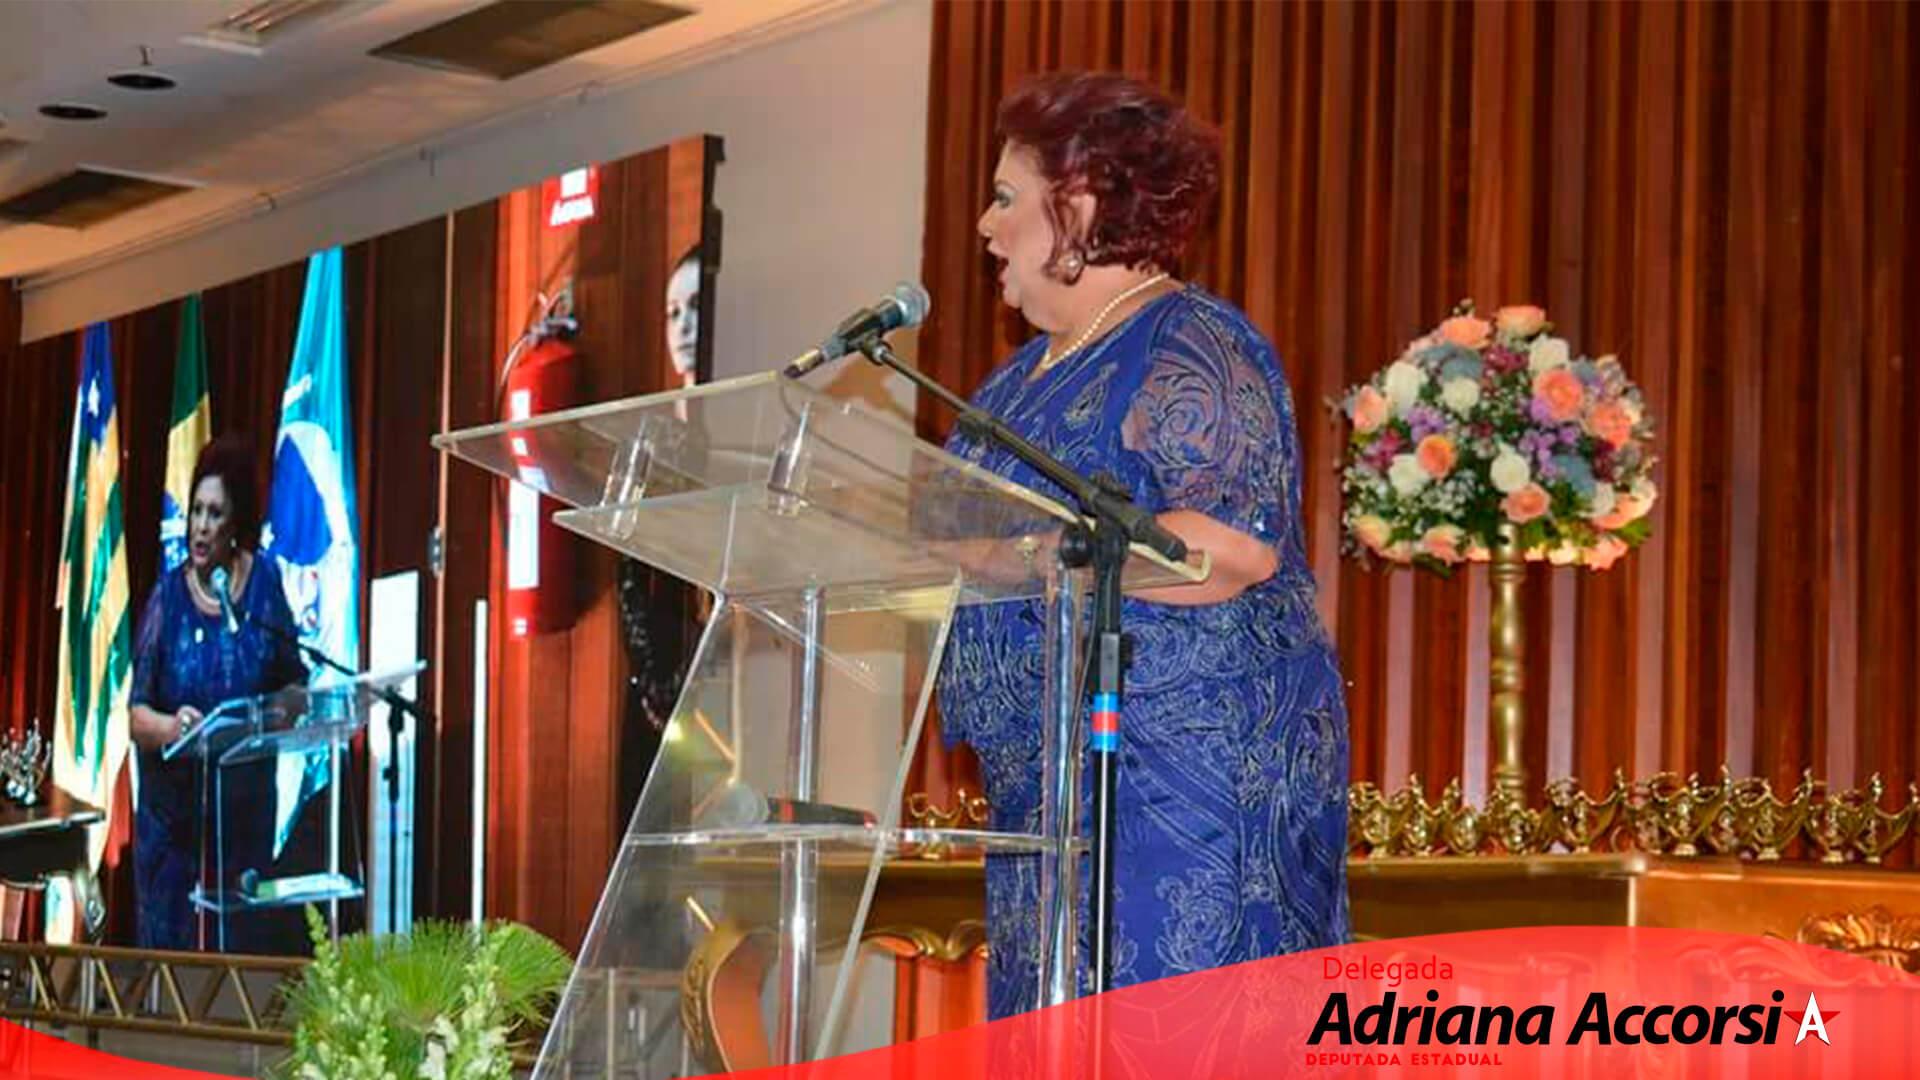 Homenagem as Enfermeiras, Enfermeiros, técnicos e auxiliares de enfermagem de Goiás